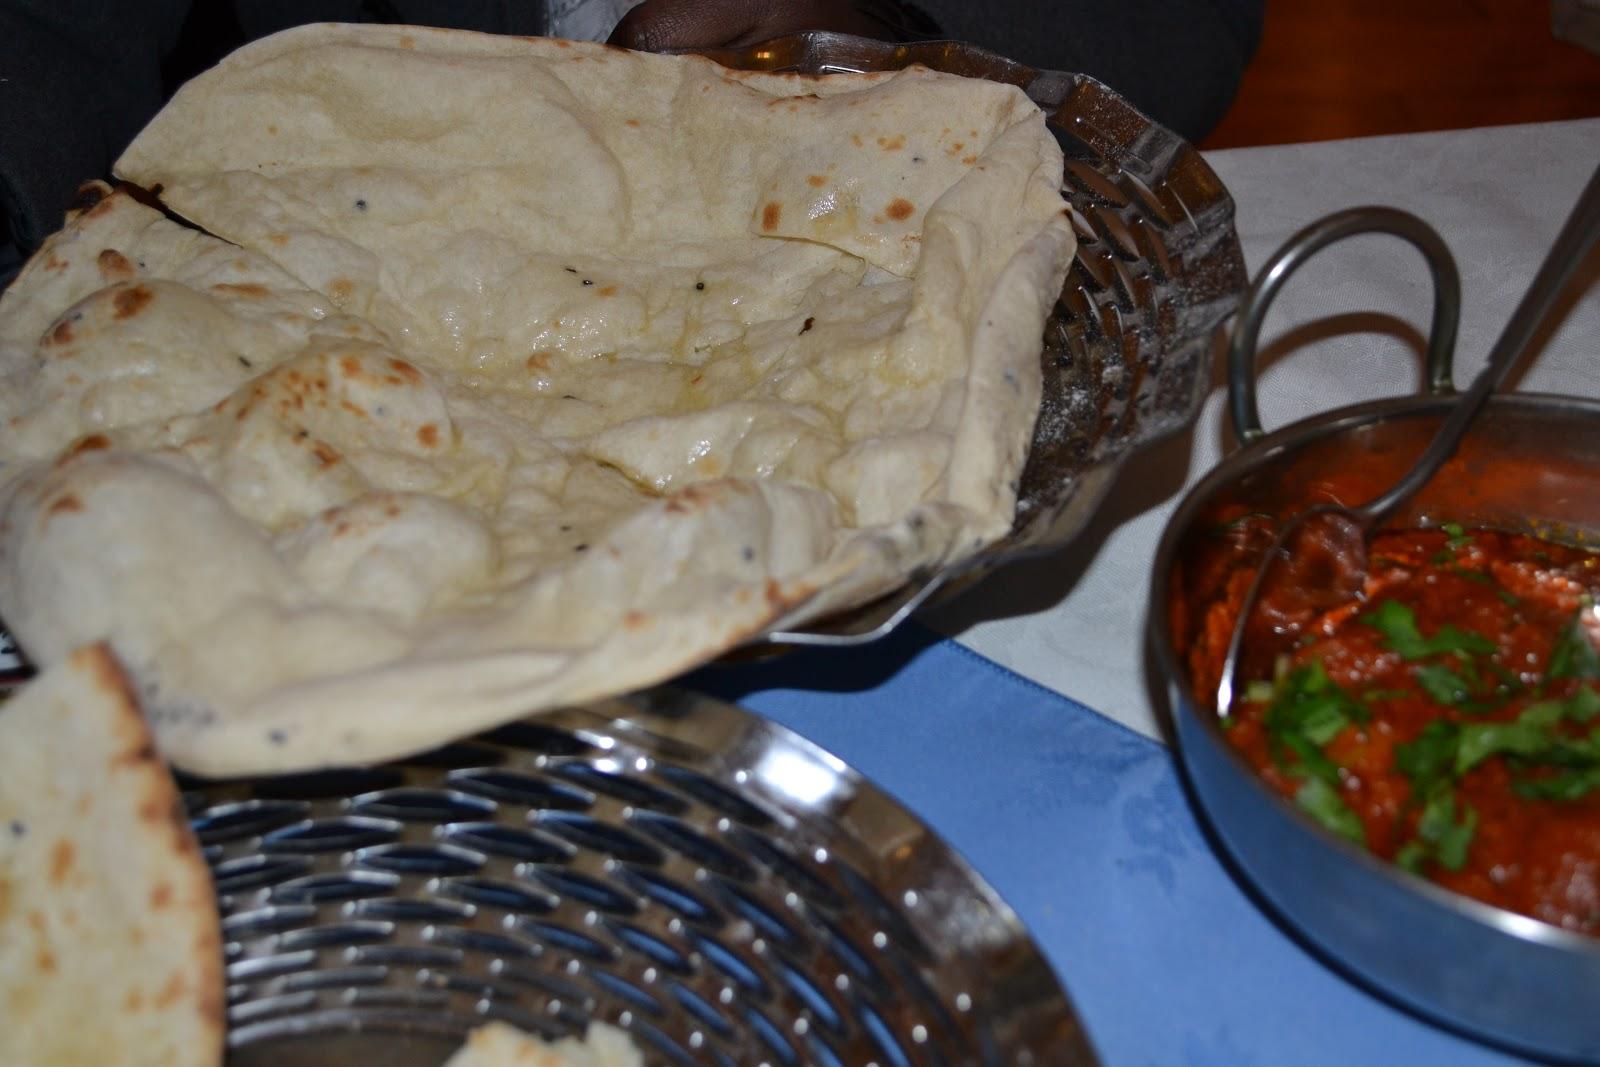 Muslimah 39 s kitchen restaurant review an najeeb cuisine for An najeeb cuisine